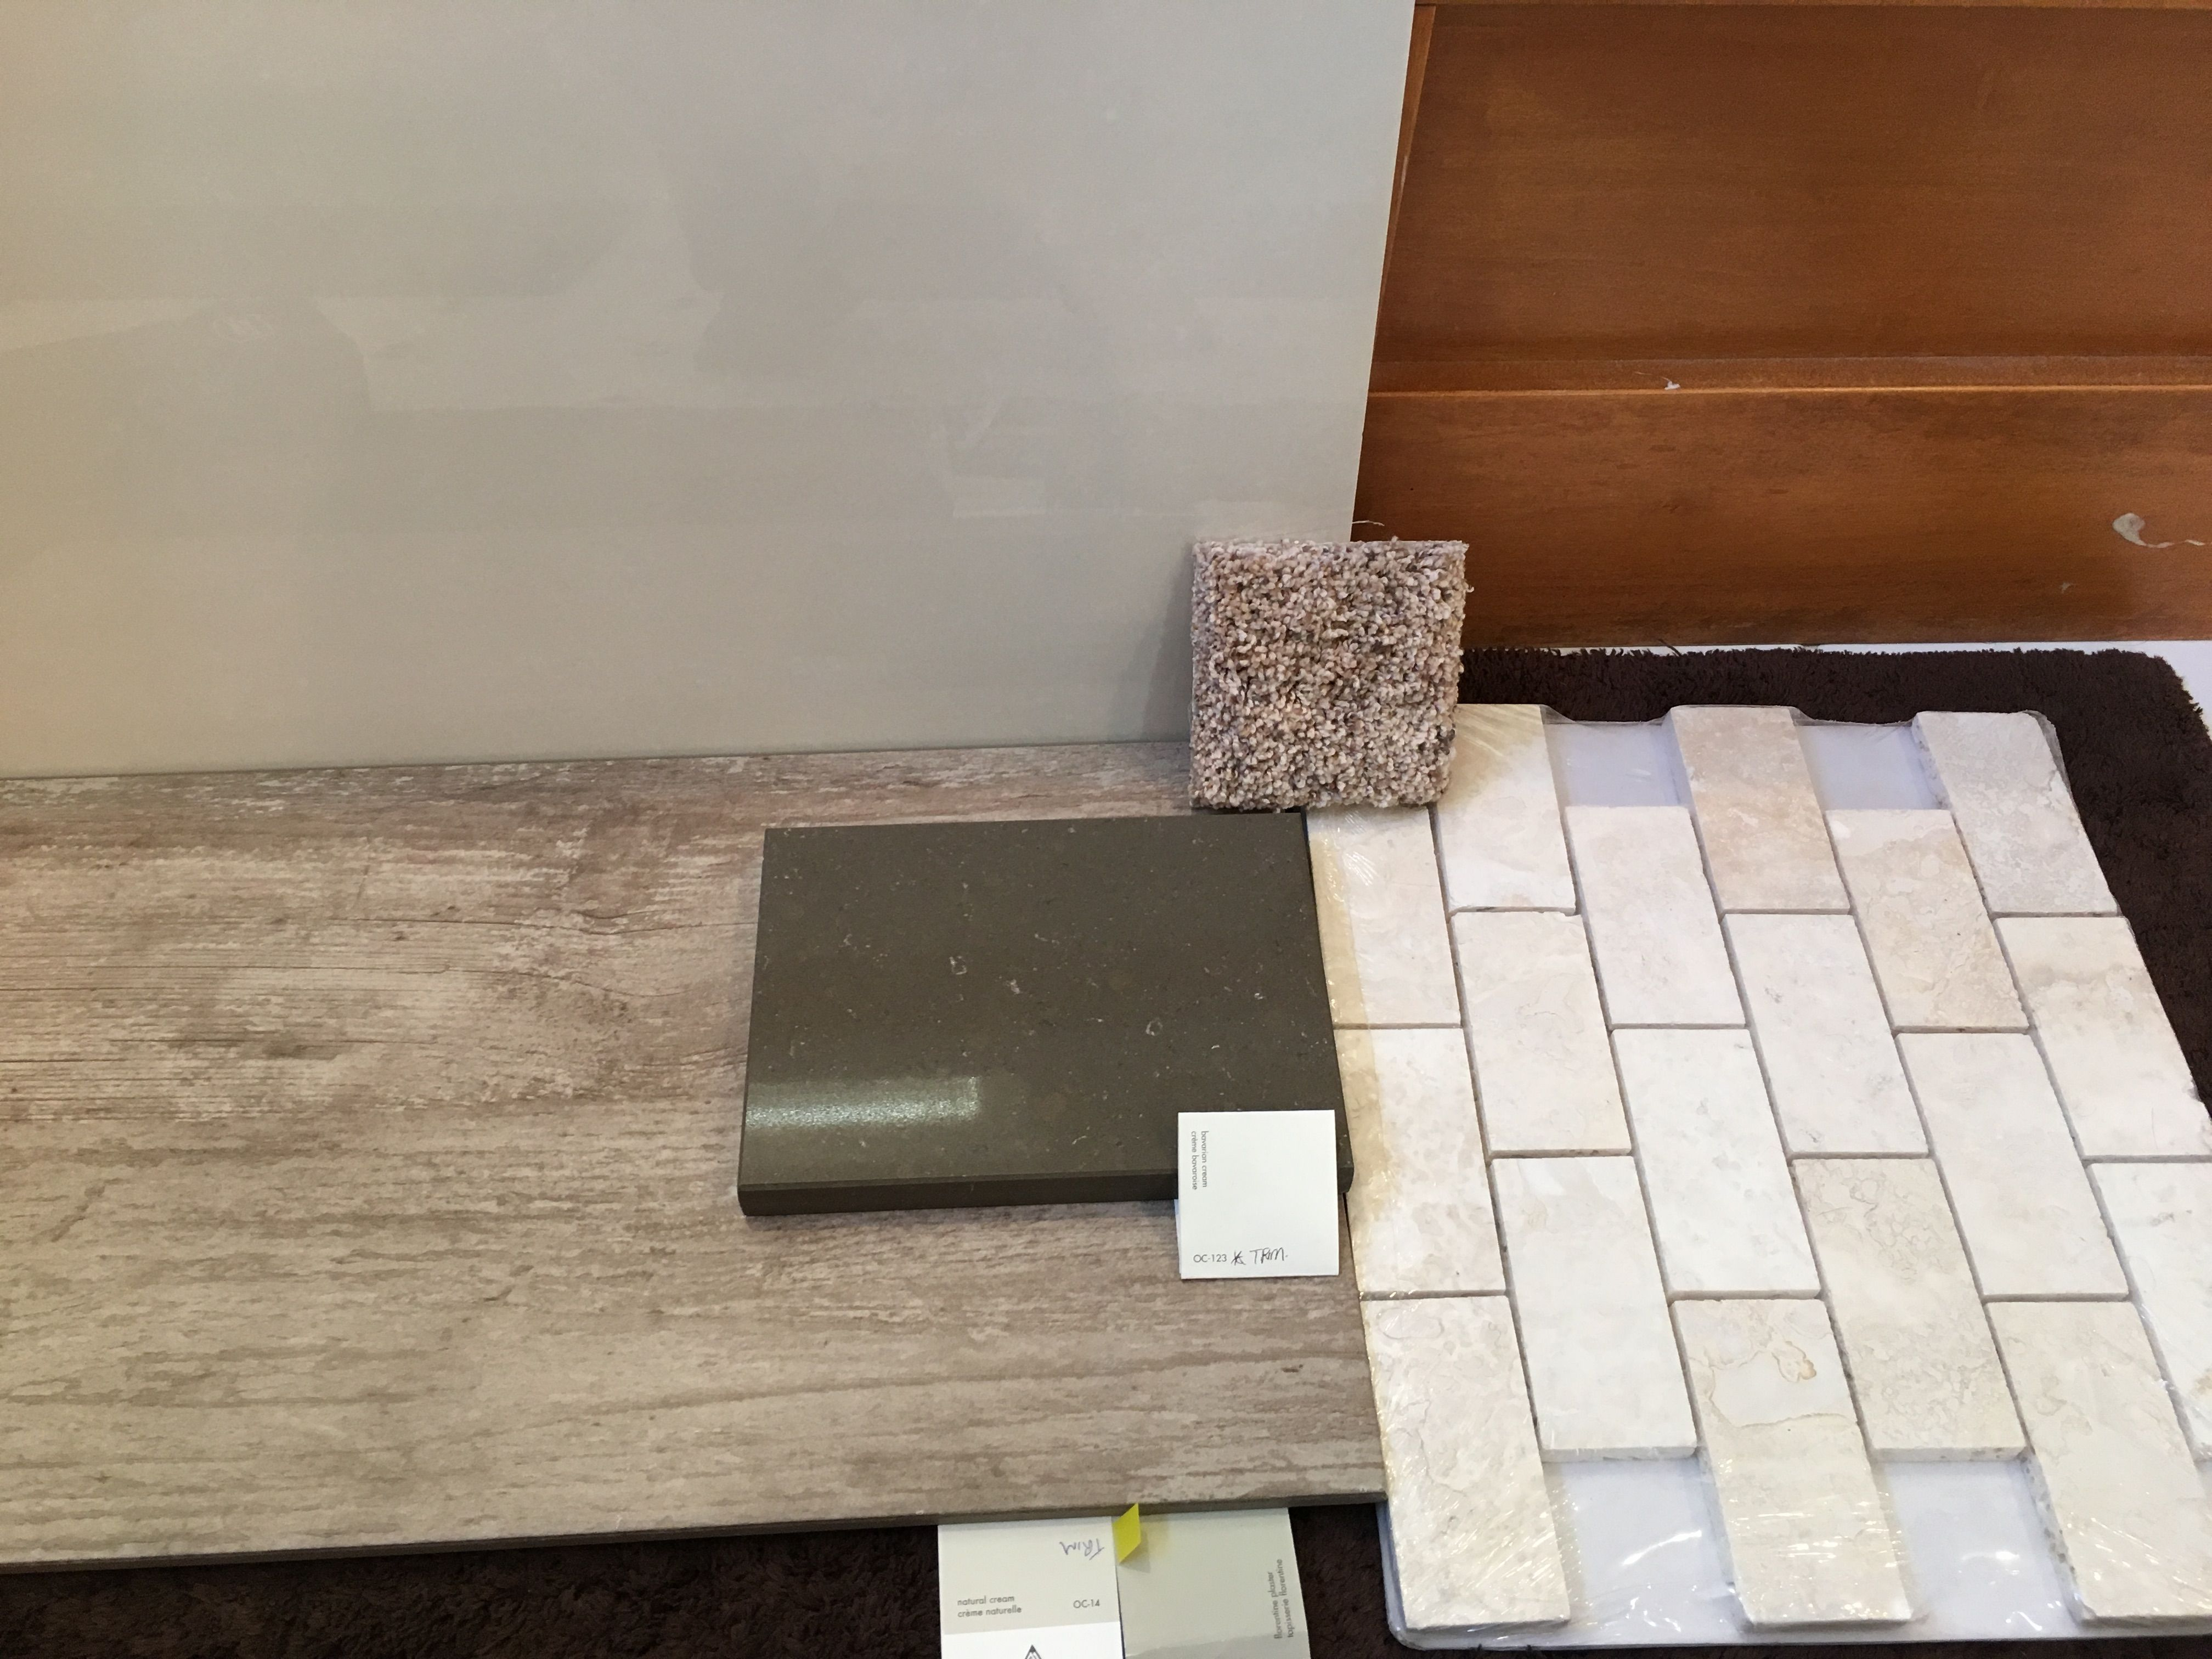 Ensuite Bathroom Colour Palate Floor Tile X TRNO Centura Tile - 2 x 4 floor tiles